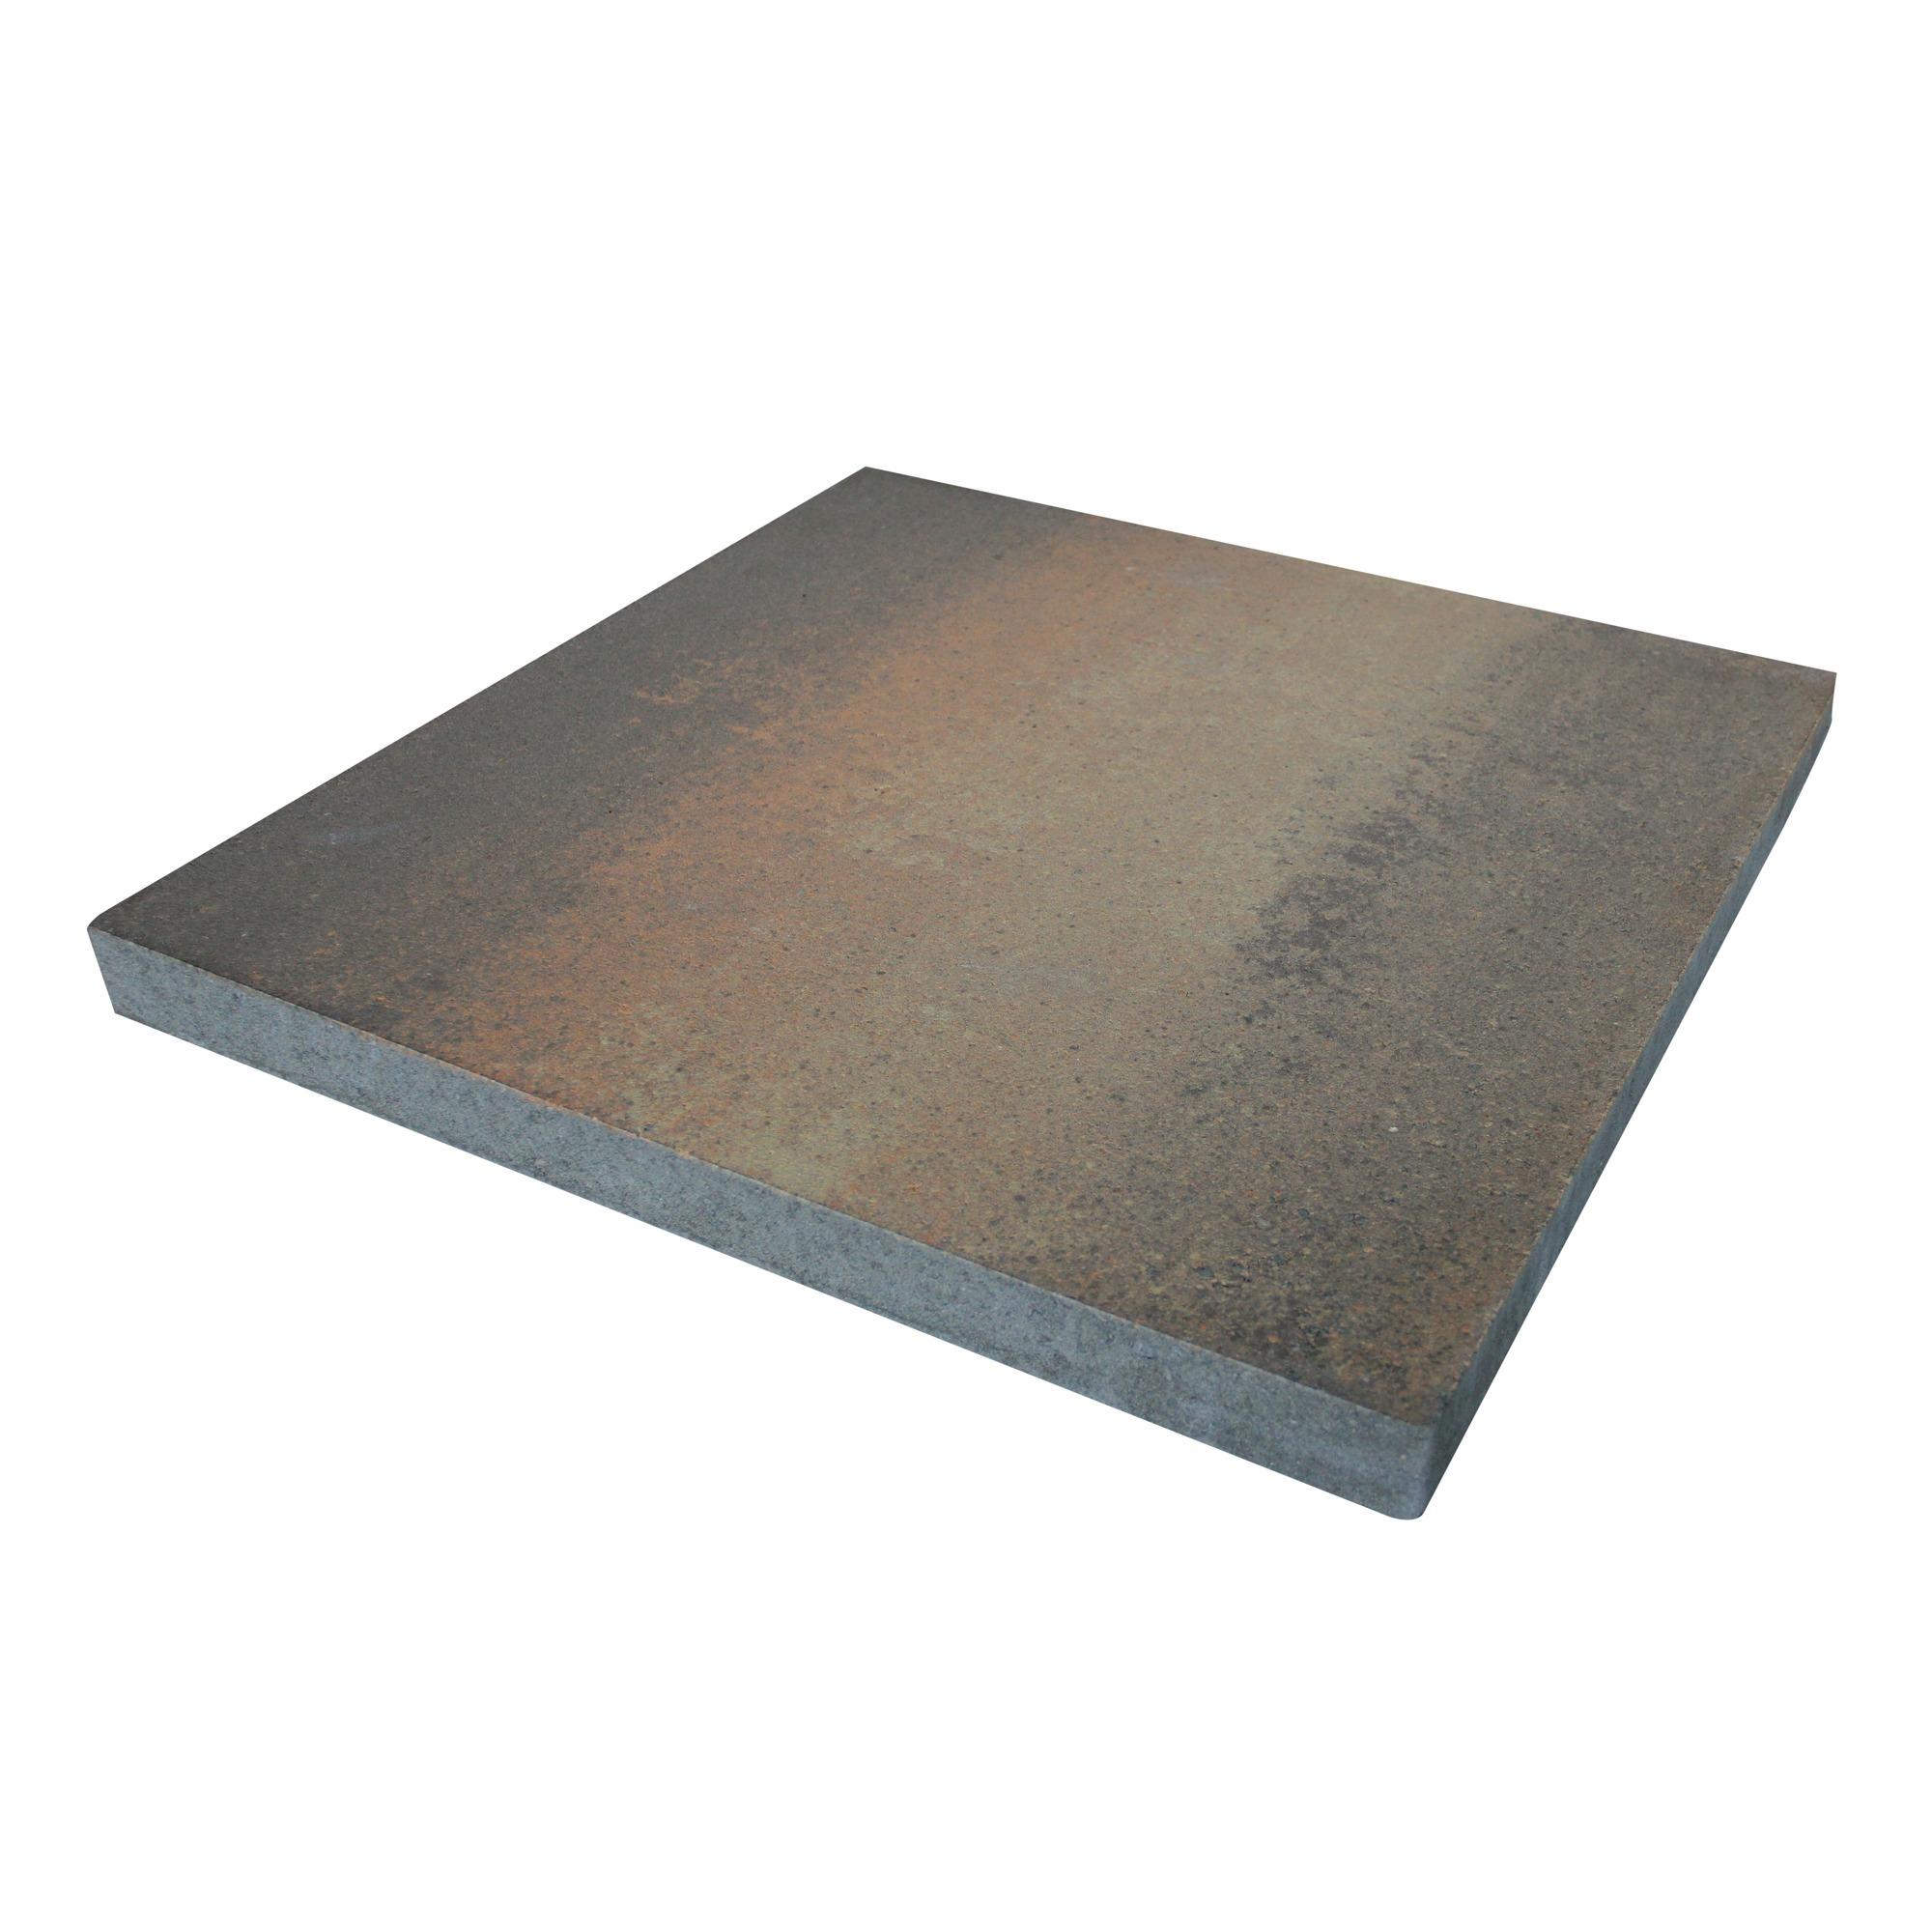 Terrastegel Beton Summerset bruin 60x60x4.7cm 0.36m2